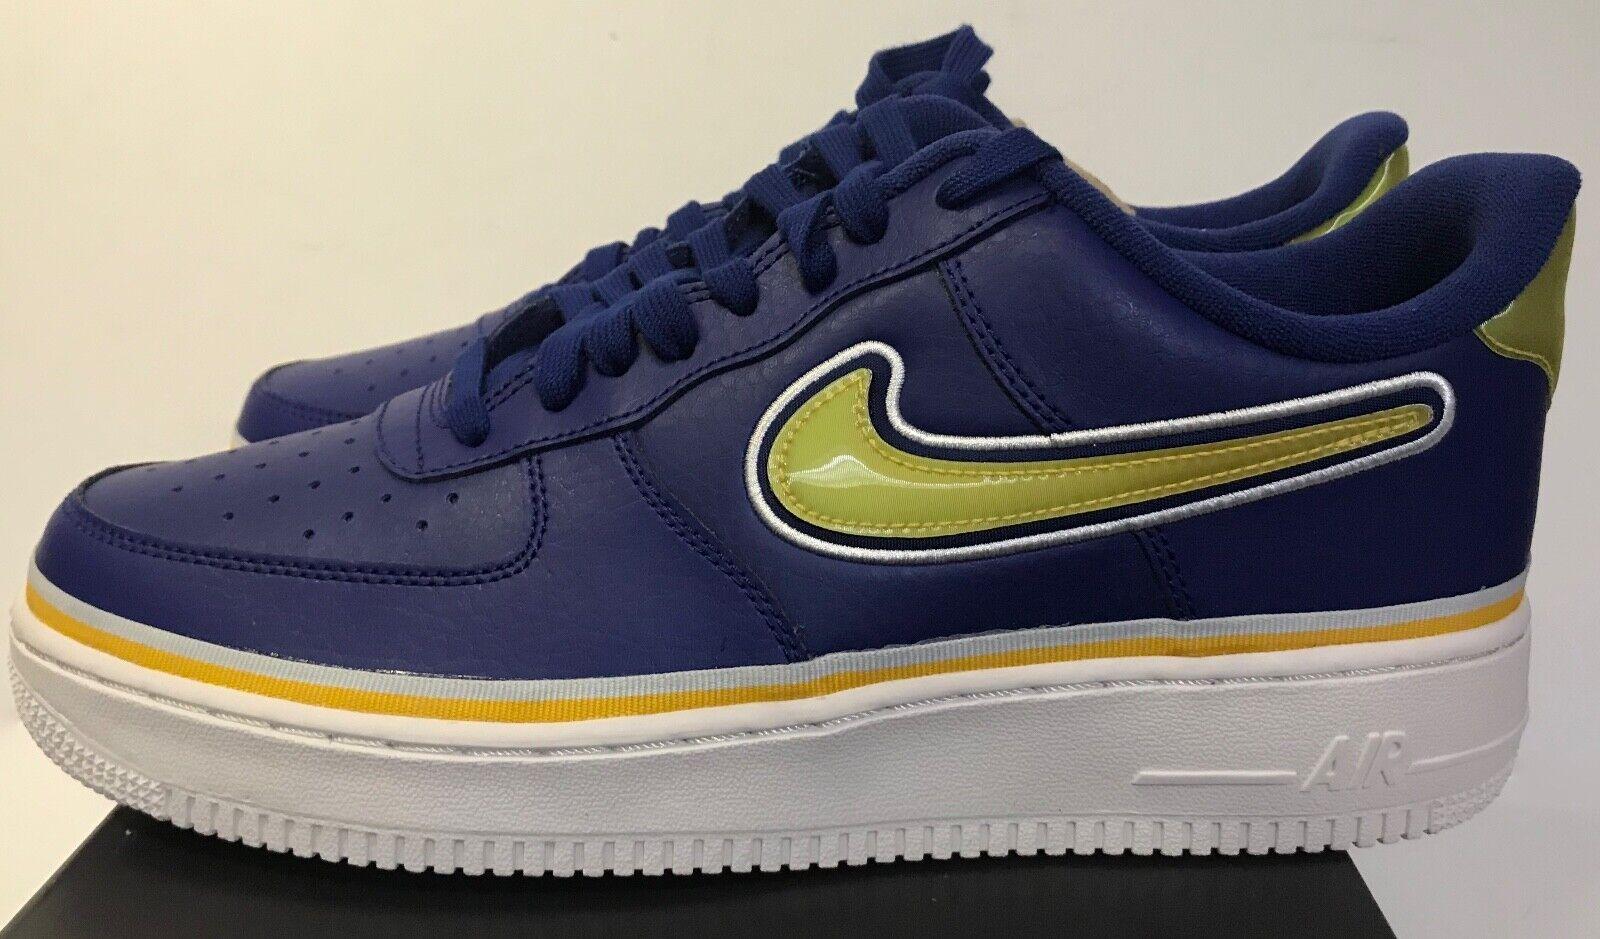 Nike Air Force 1 Low Lv8 Nba Warriors Deep Royal Blue Yellow